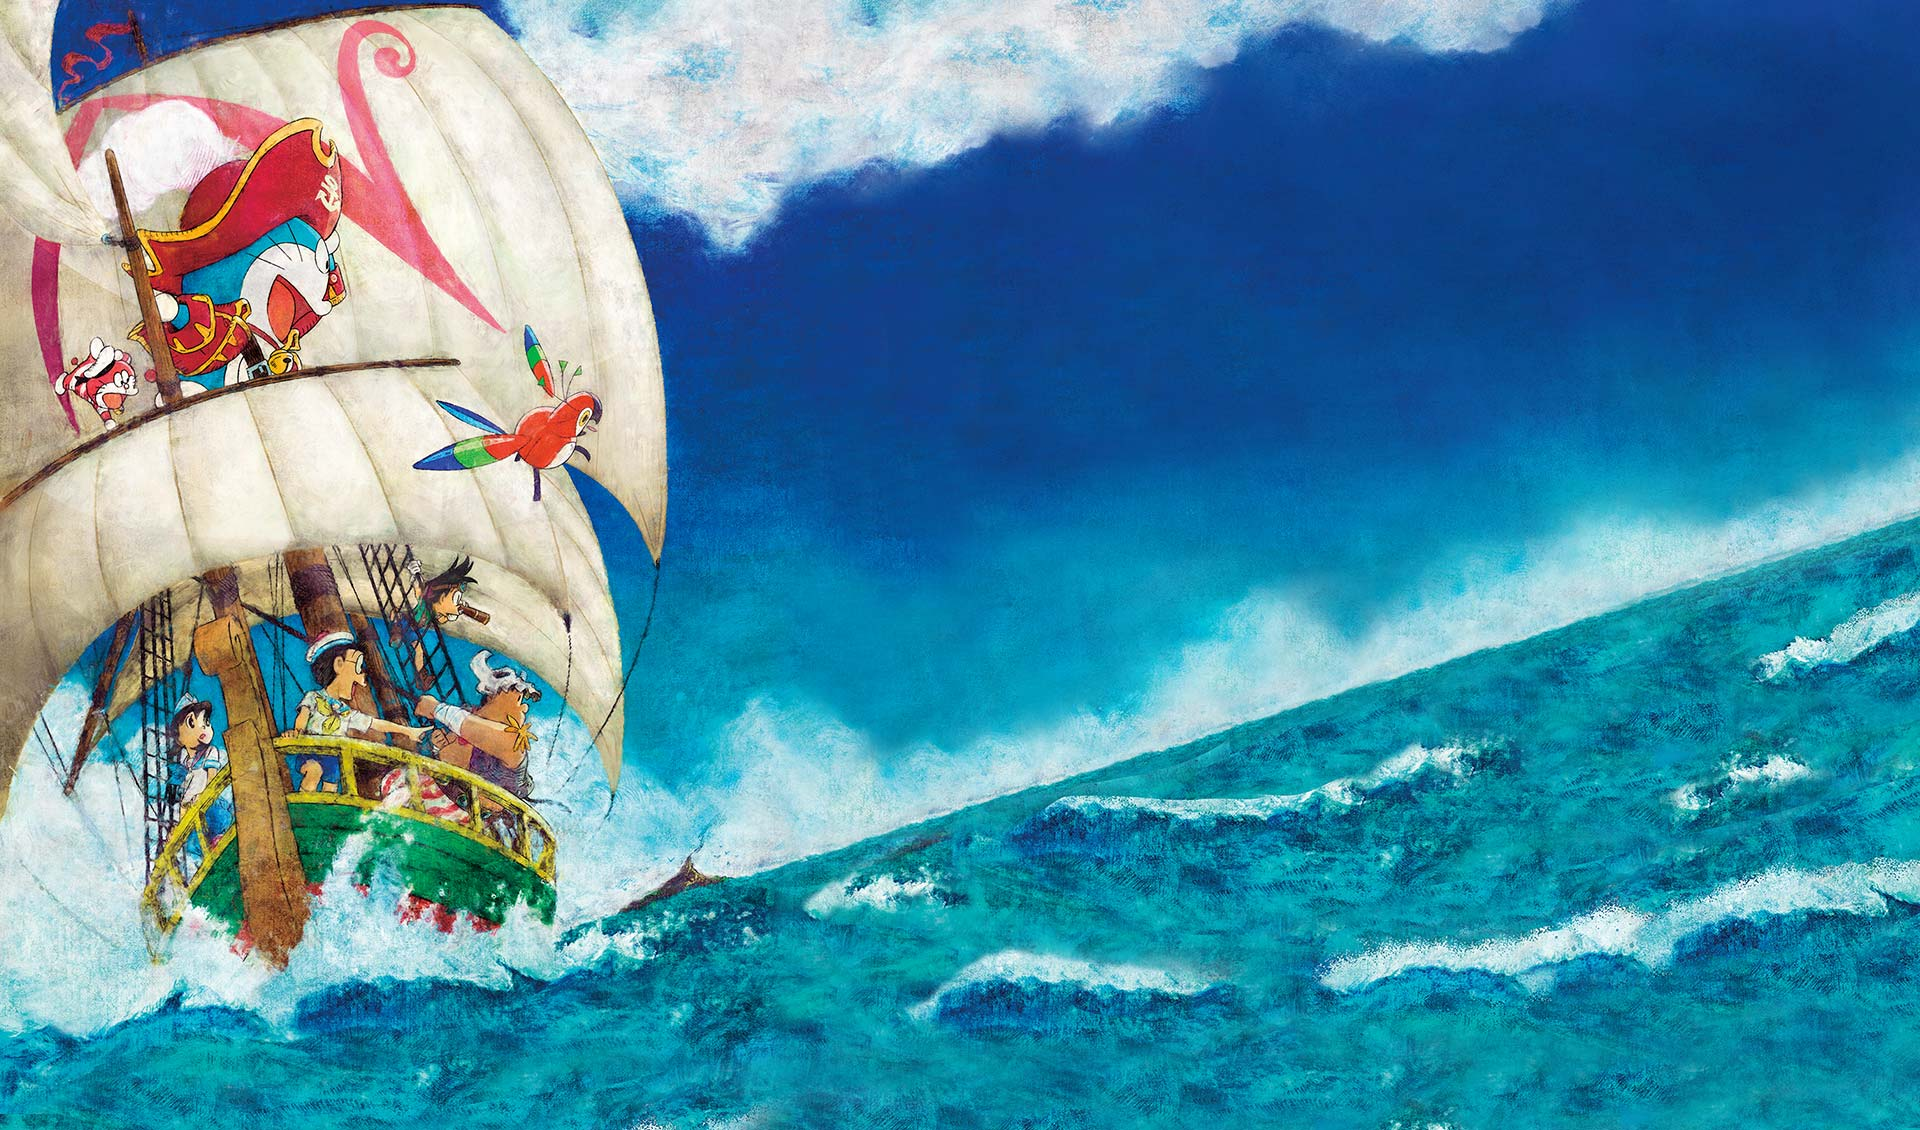 Doraemon: Nobita's Treasure Island (2018)